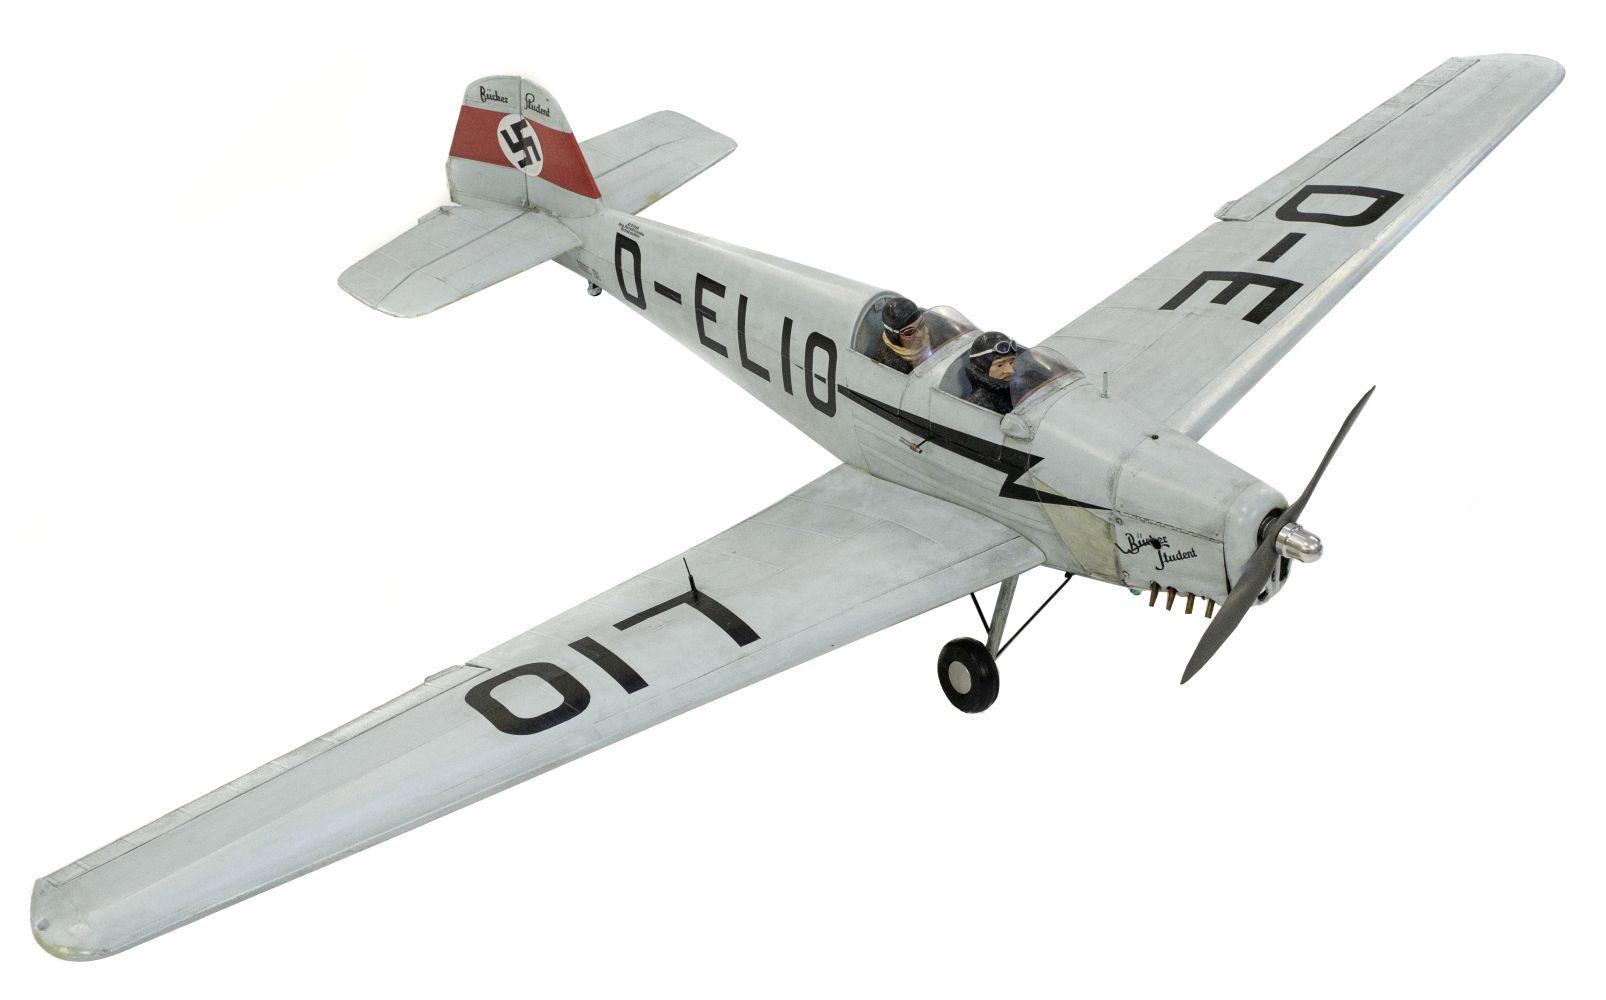 * Flying Model Aircraft